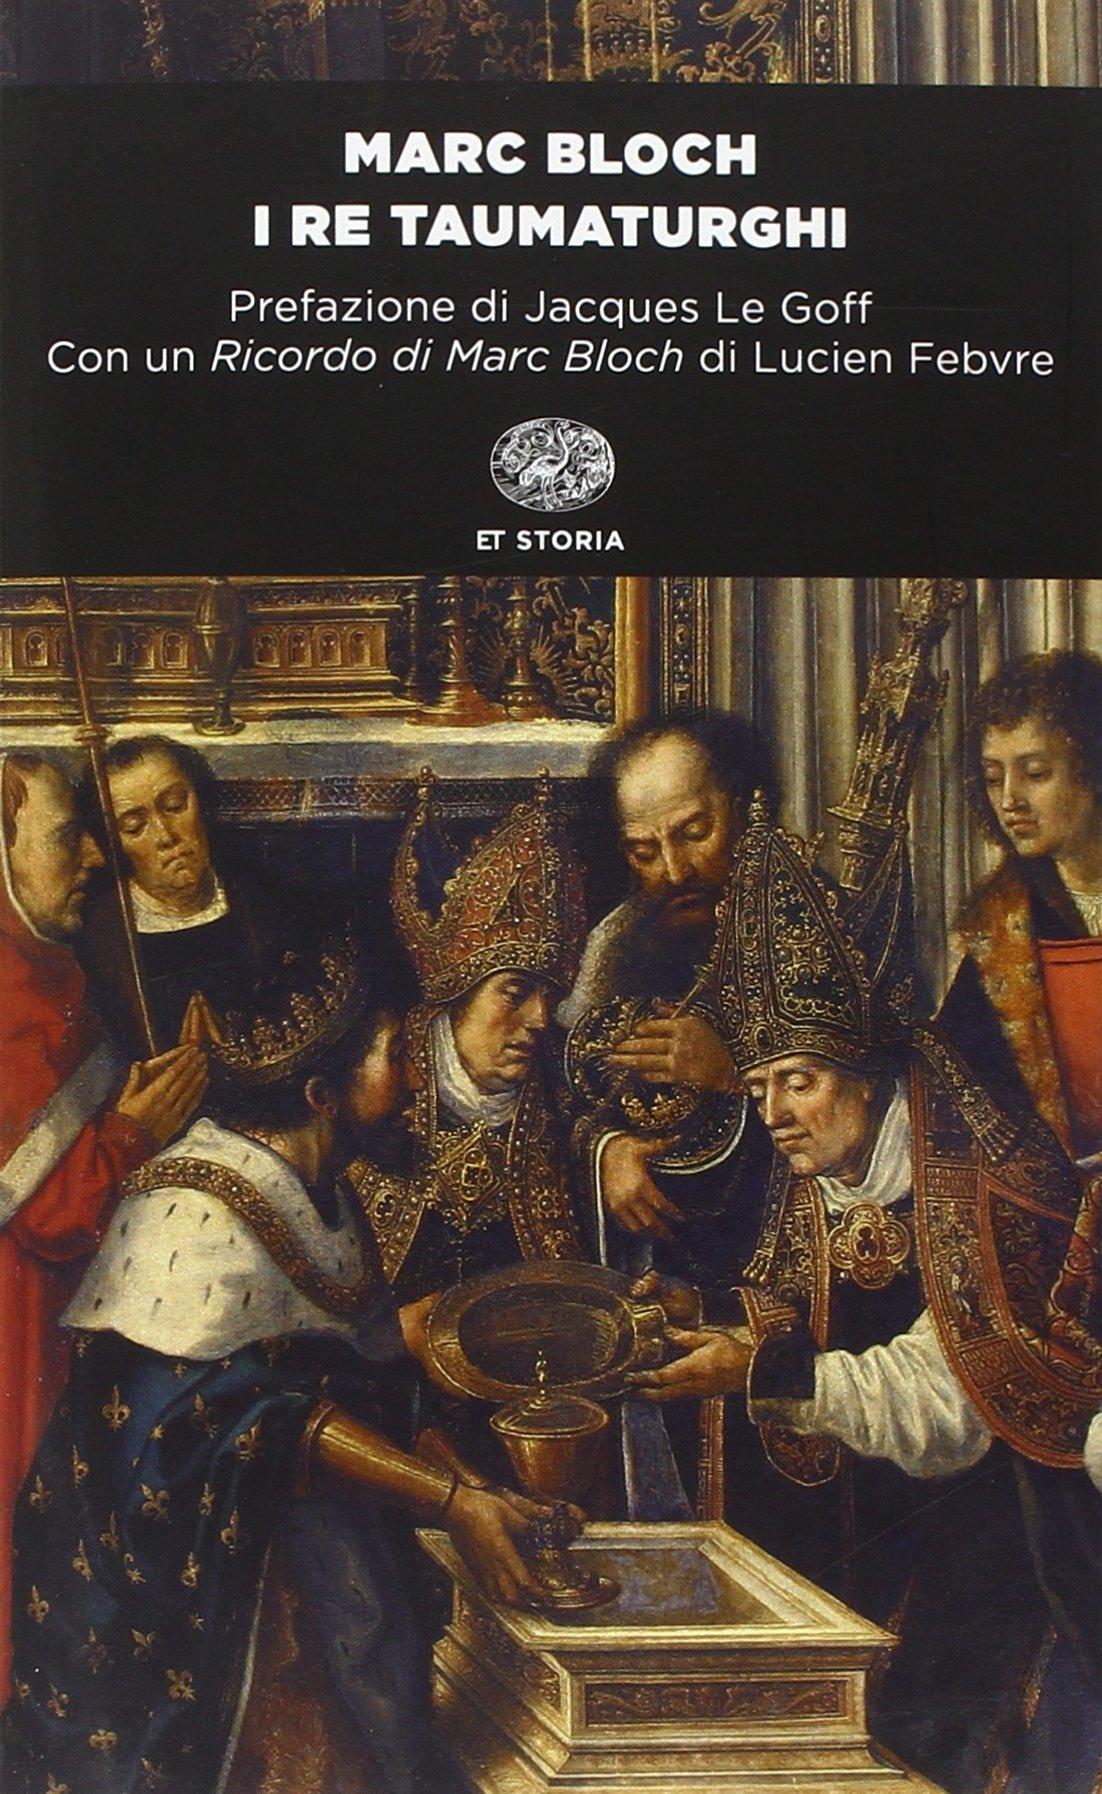 I re taumaturghi: Amazon.it: Bloch, Marc: Libri